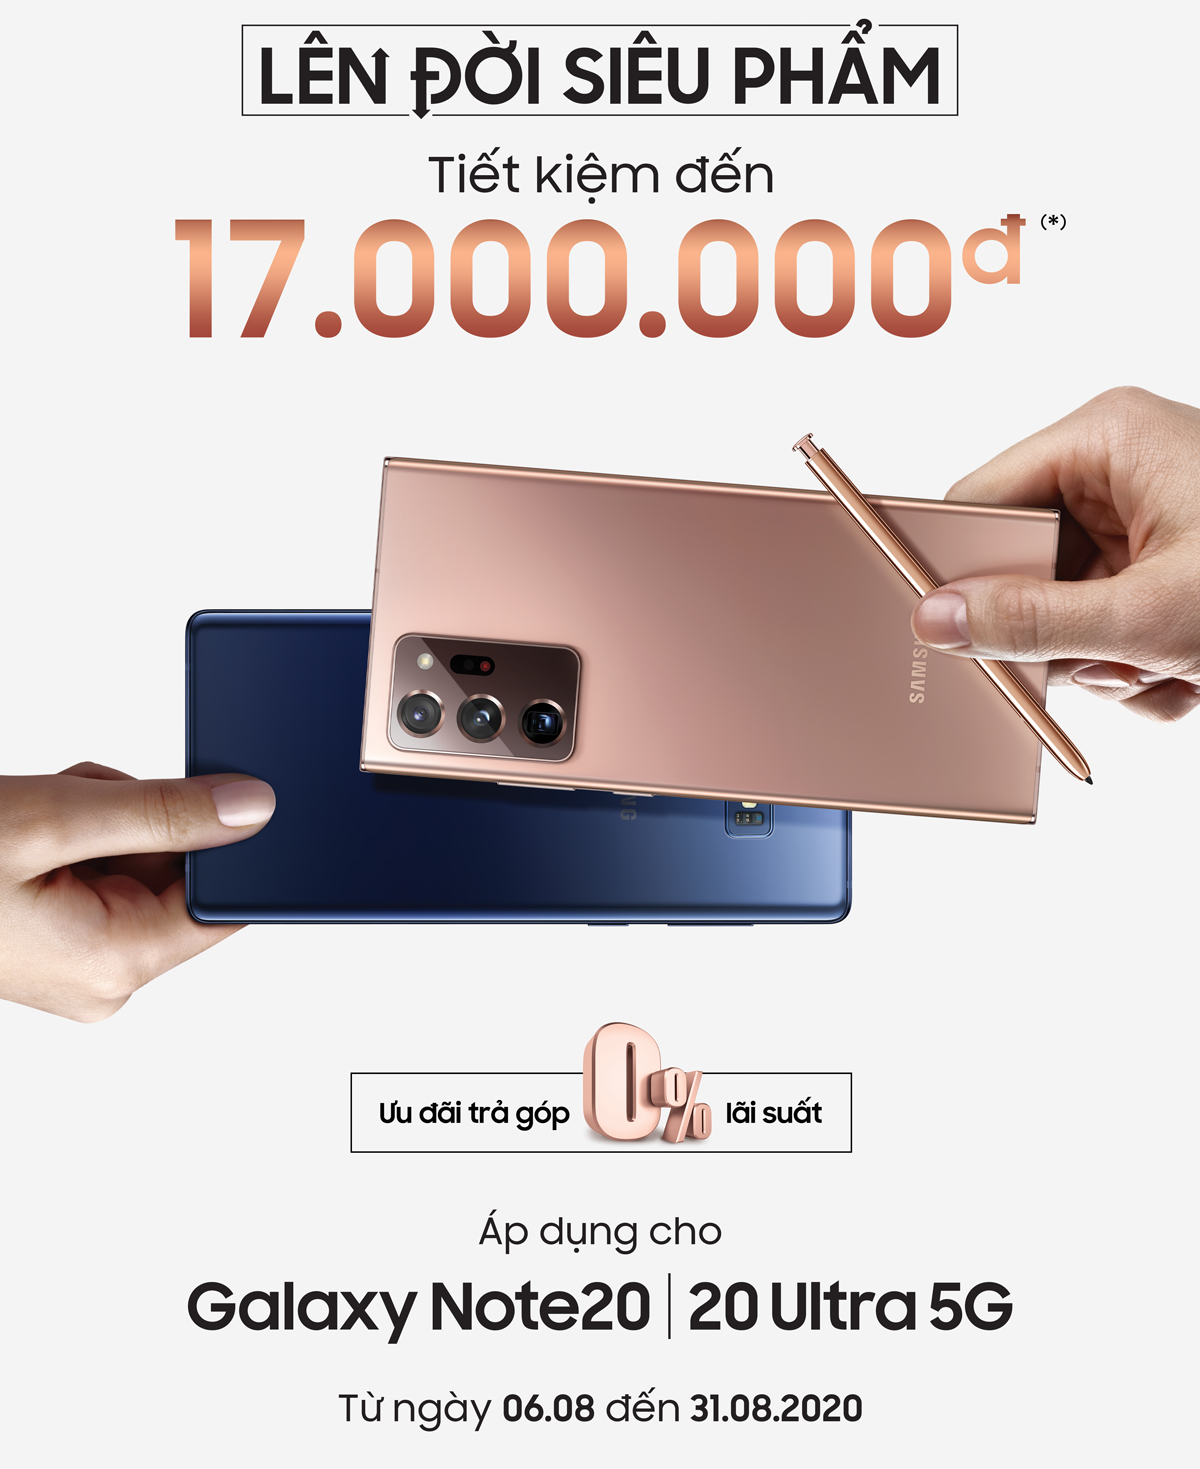 tradein-note20-mobile